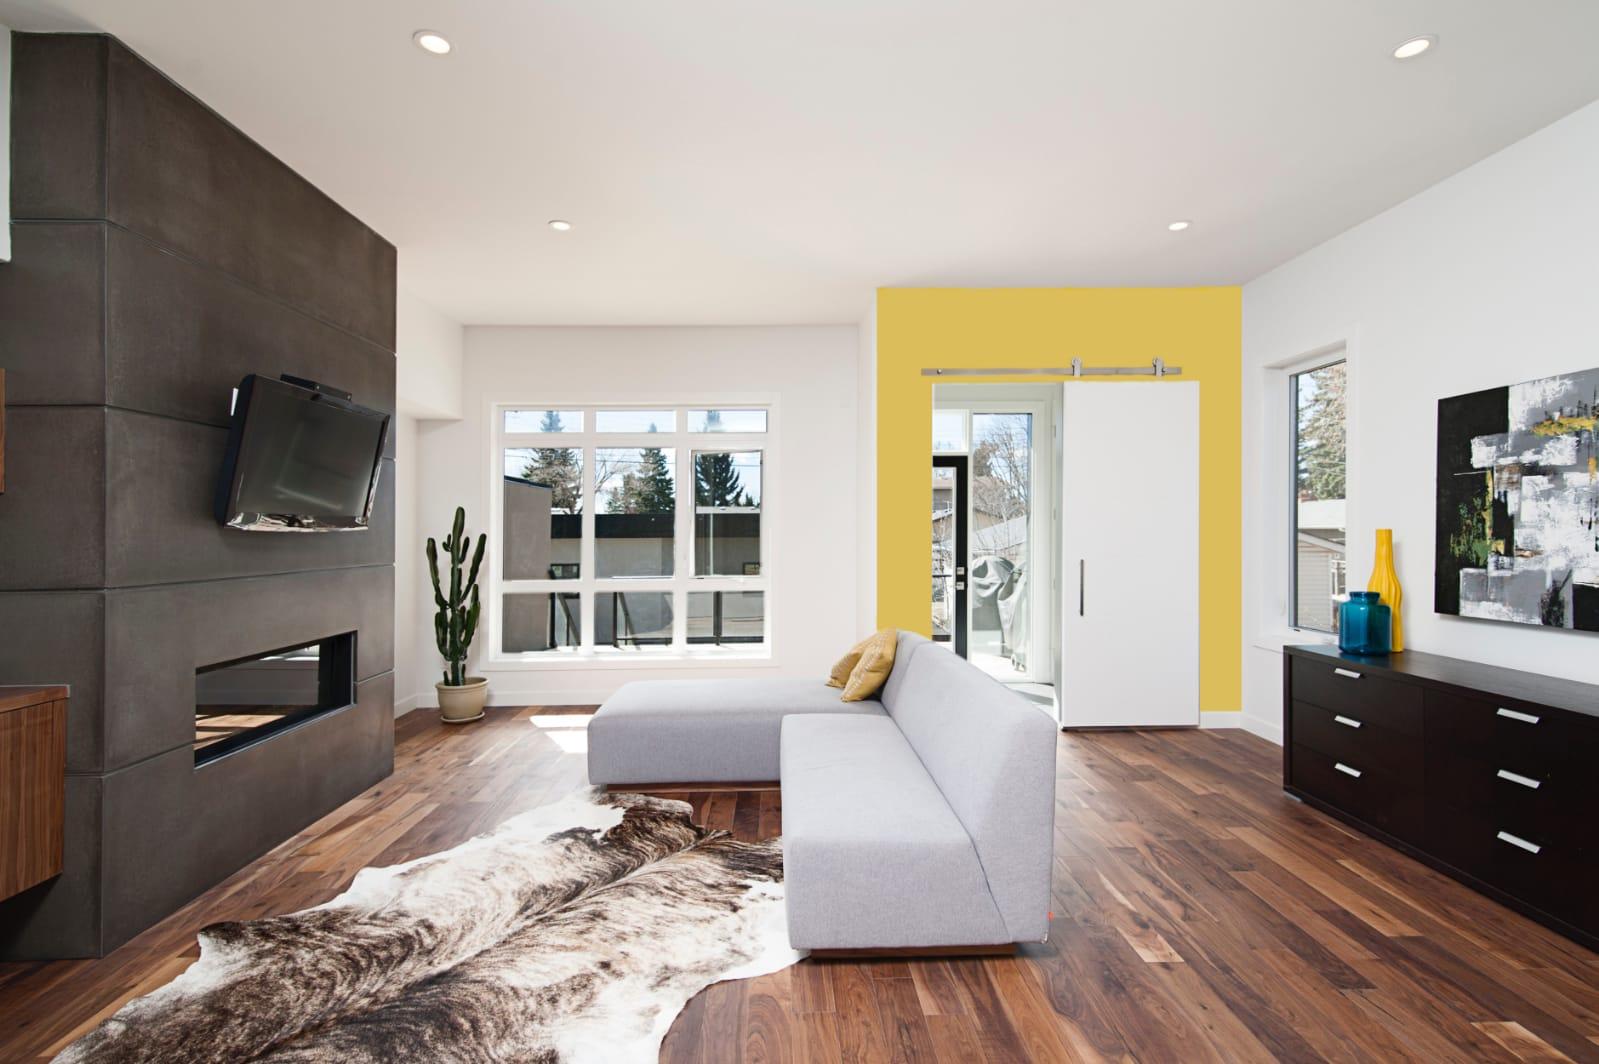 Can's living room photo option 2.jpg